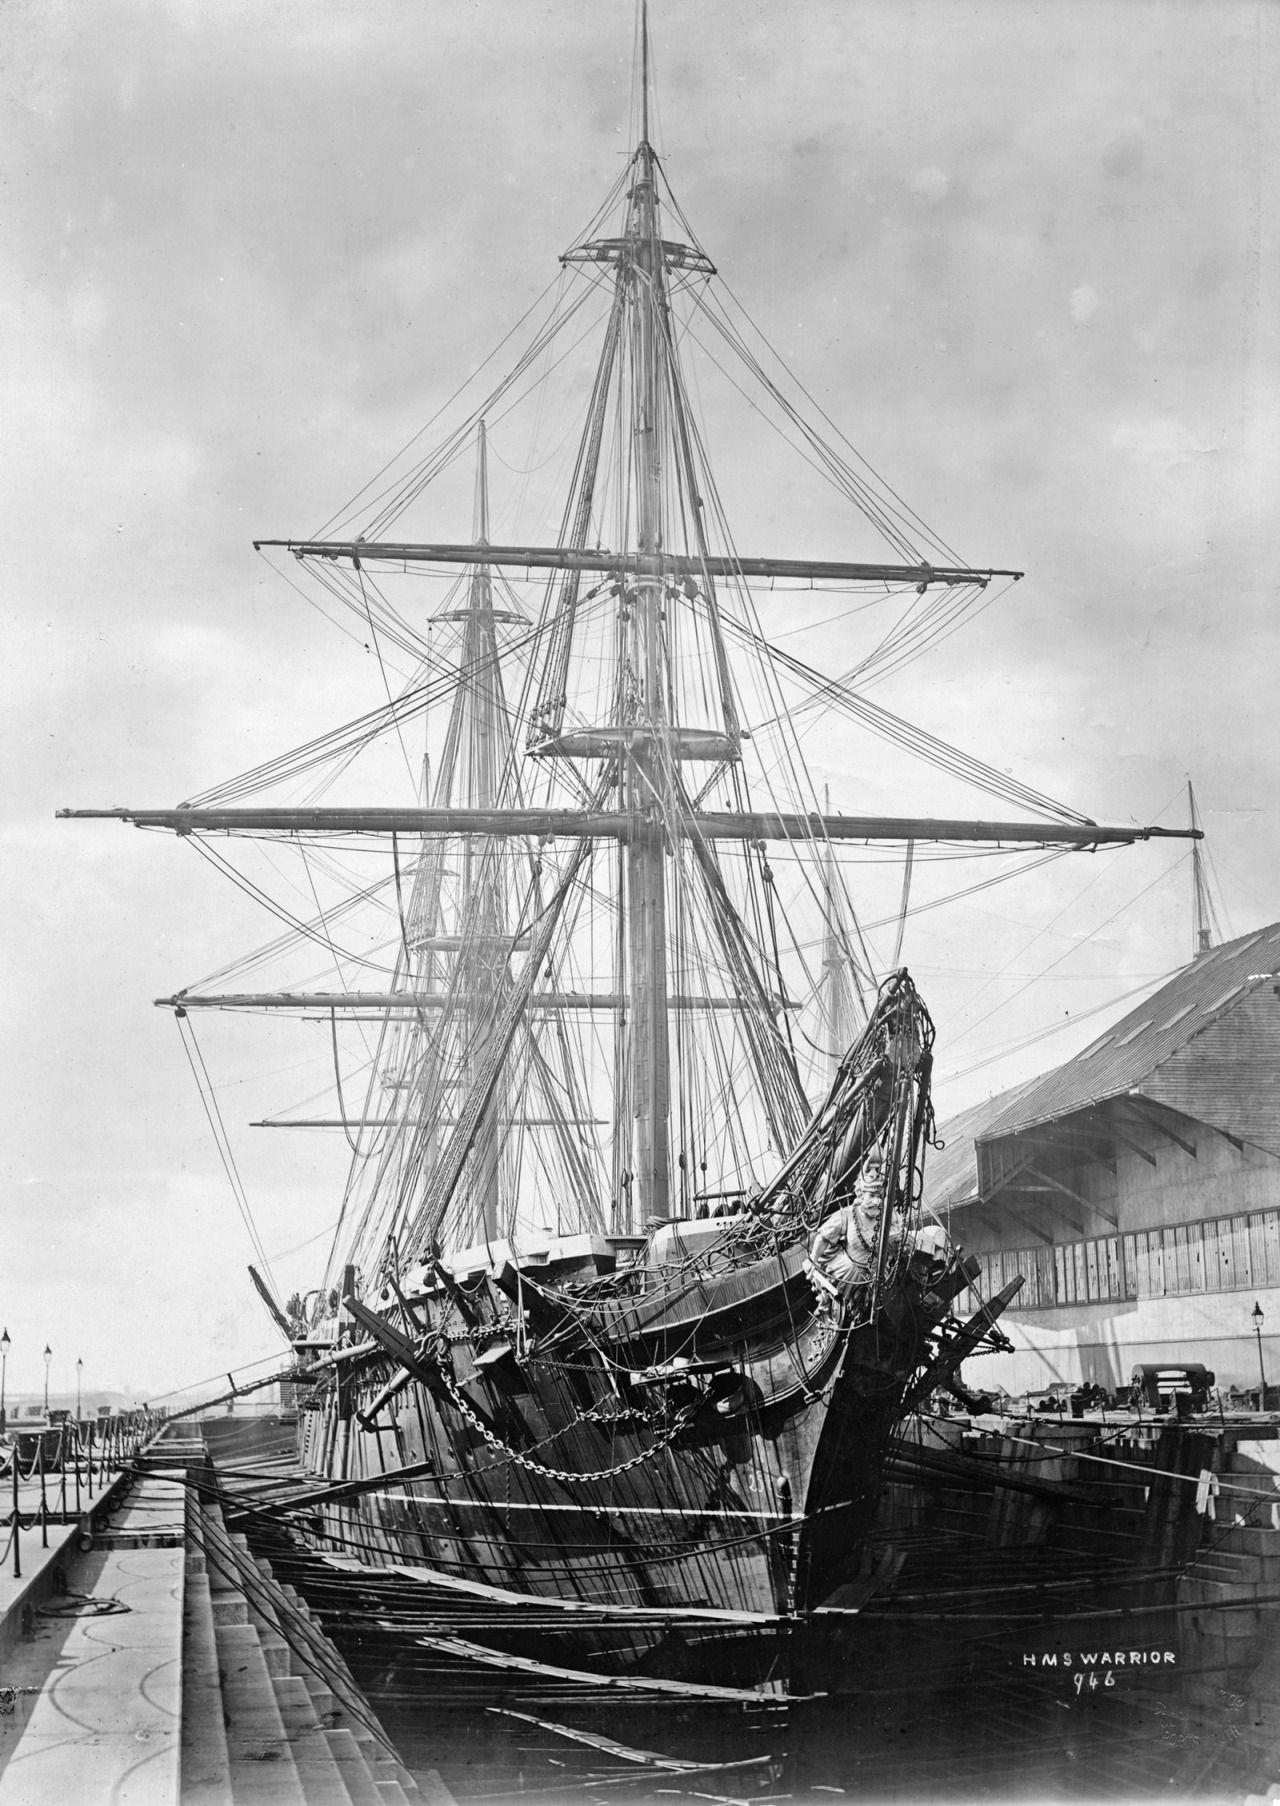 hms-surprise: HMS Warrior at Portsmouth's No.10 dry dock undergoing a major refit. 1872-1875